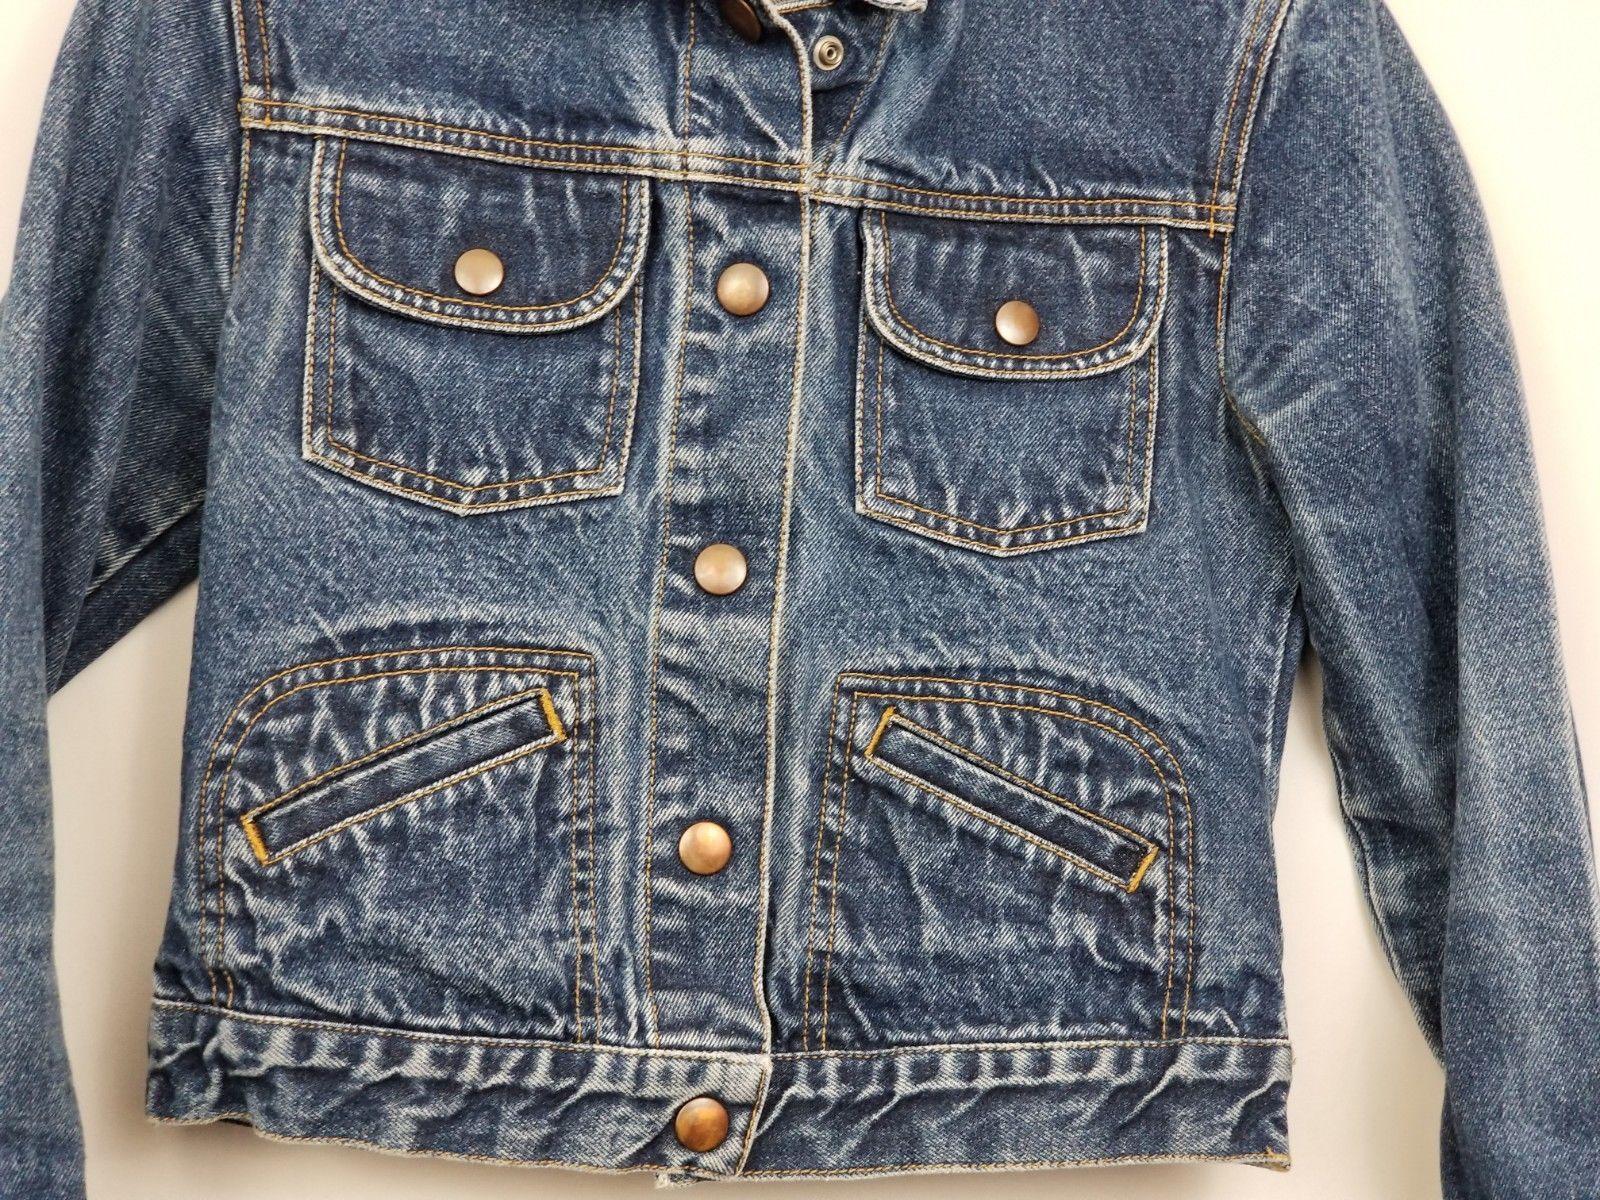 GAP Kids Denim Jean Jacket Coat Long Sleeve Blue Pockets Large Factory Store